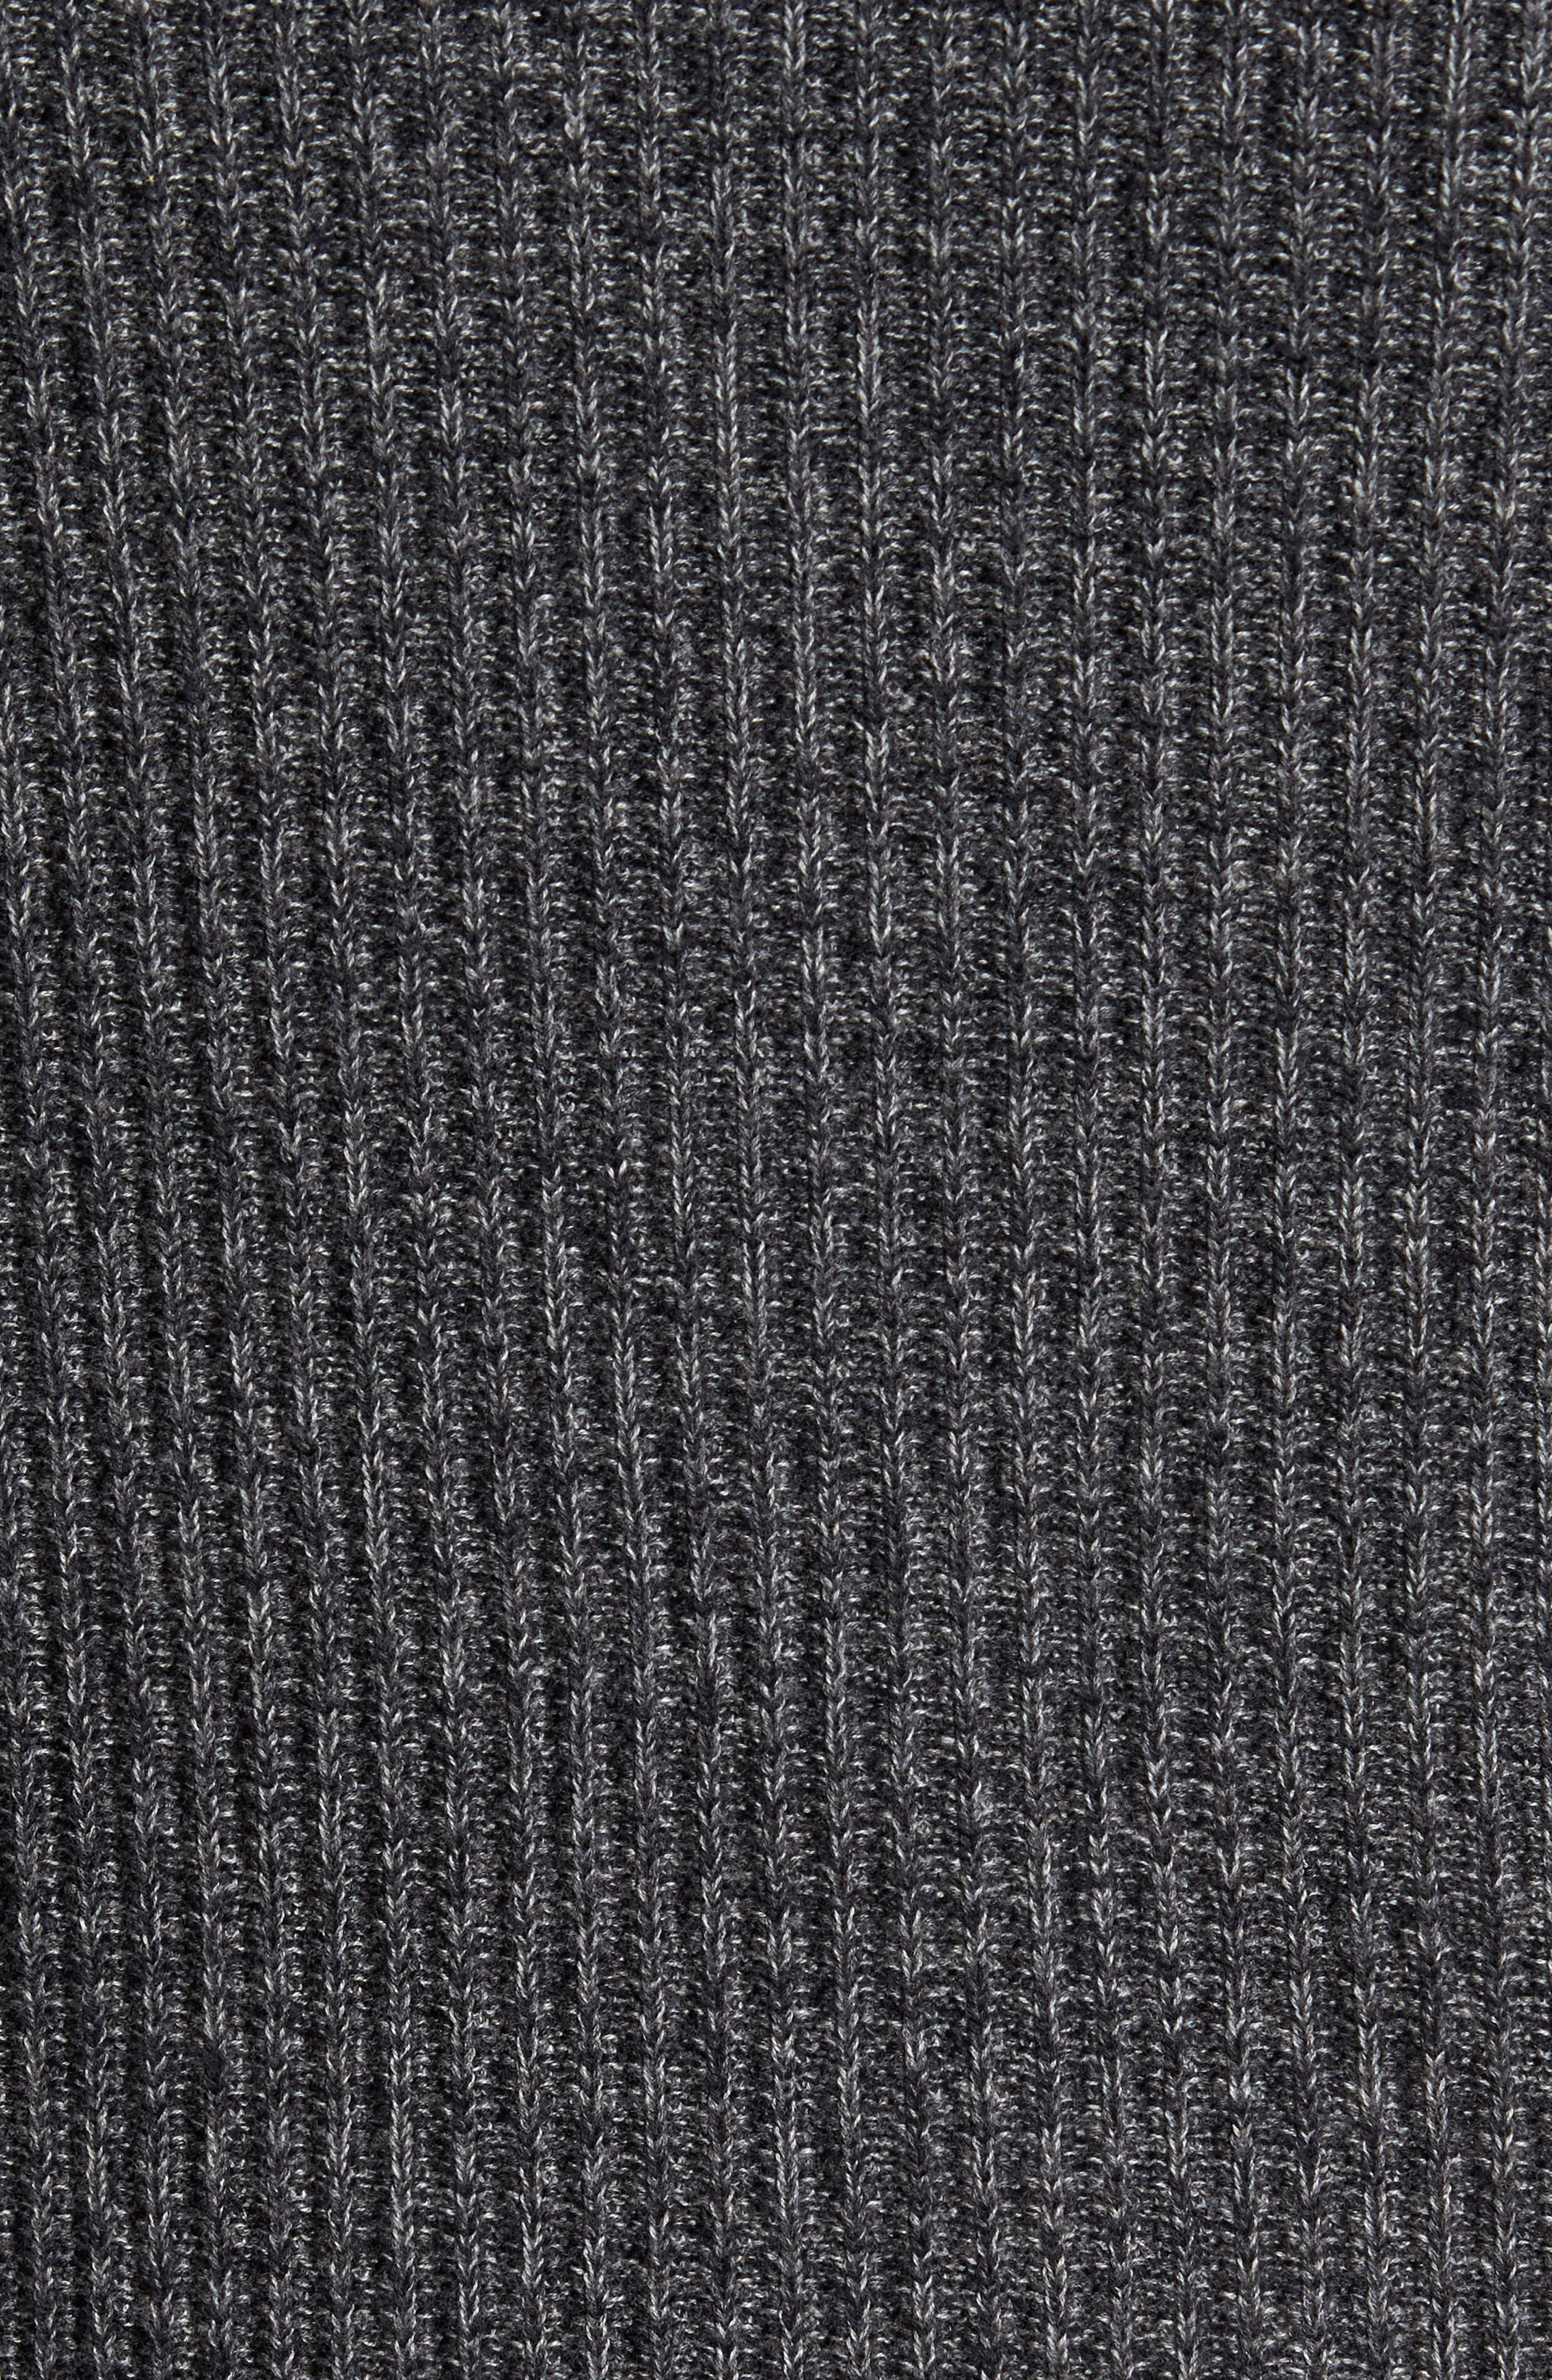 Medina Marl Cotton Sweater,                             Alternate thumbnail 10, color,